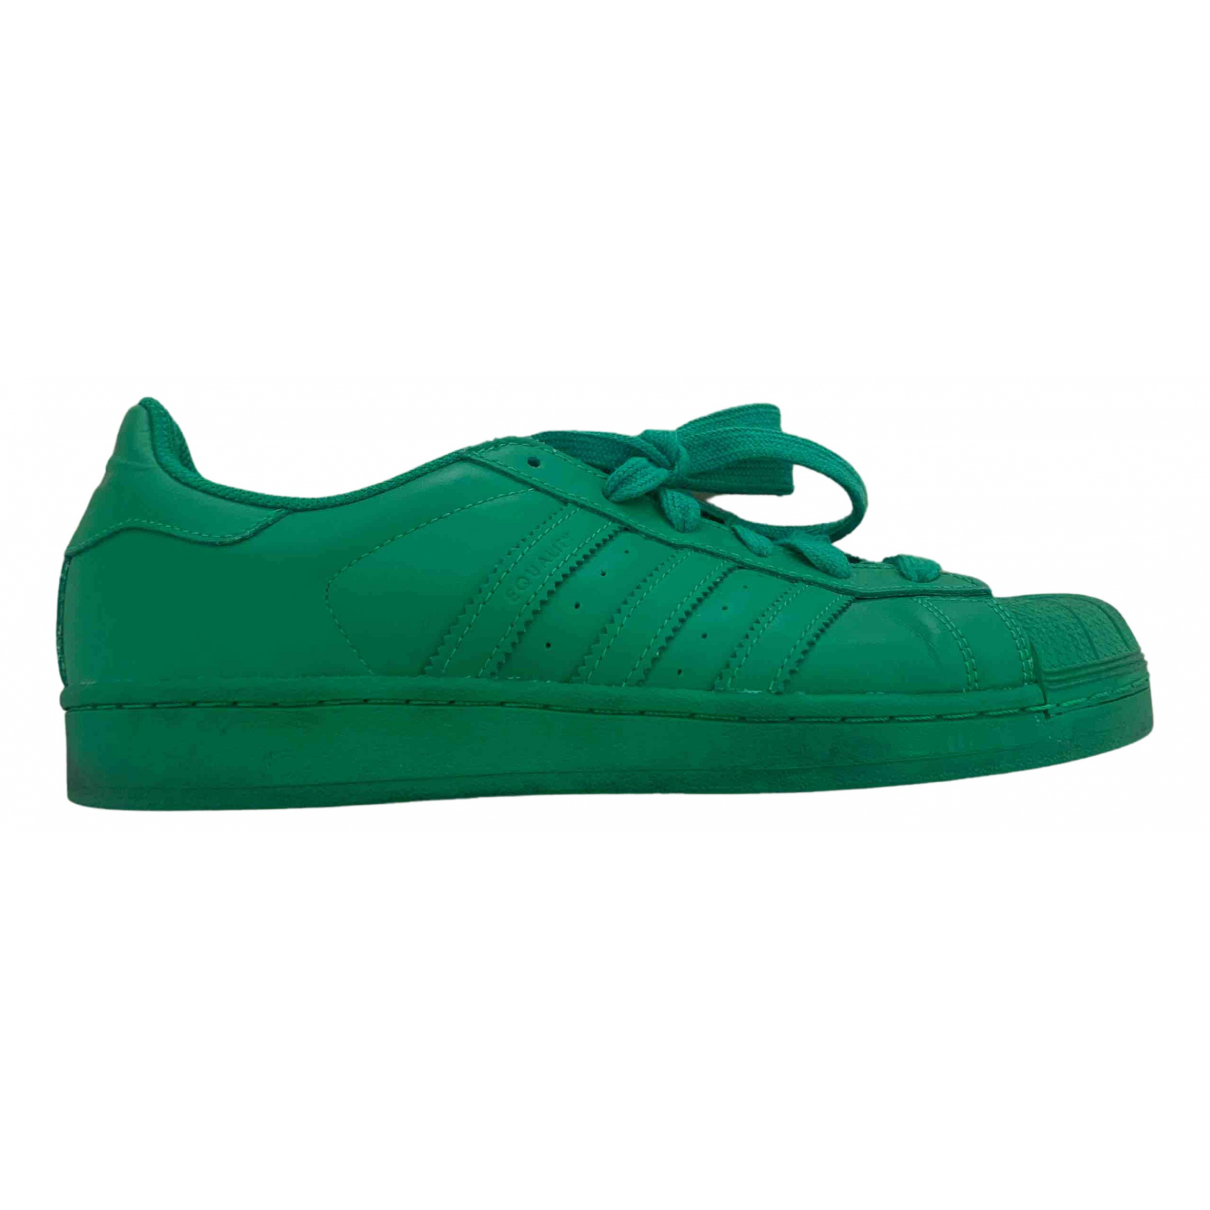 Deportivas de Pelo sintetico Adidas X Pharrell Williams